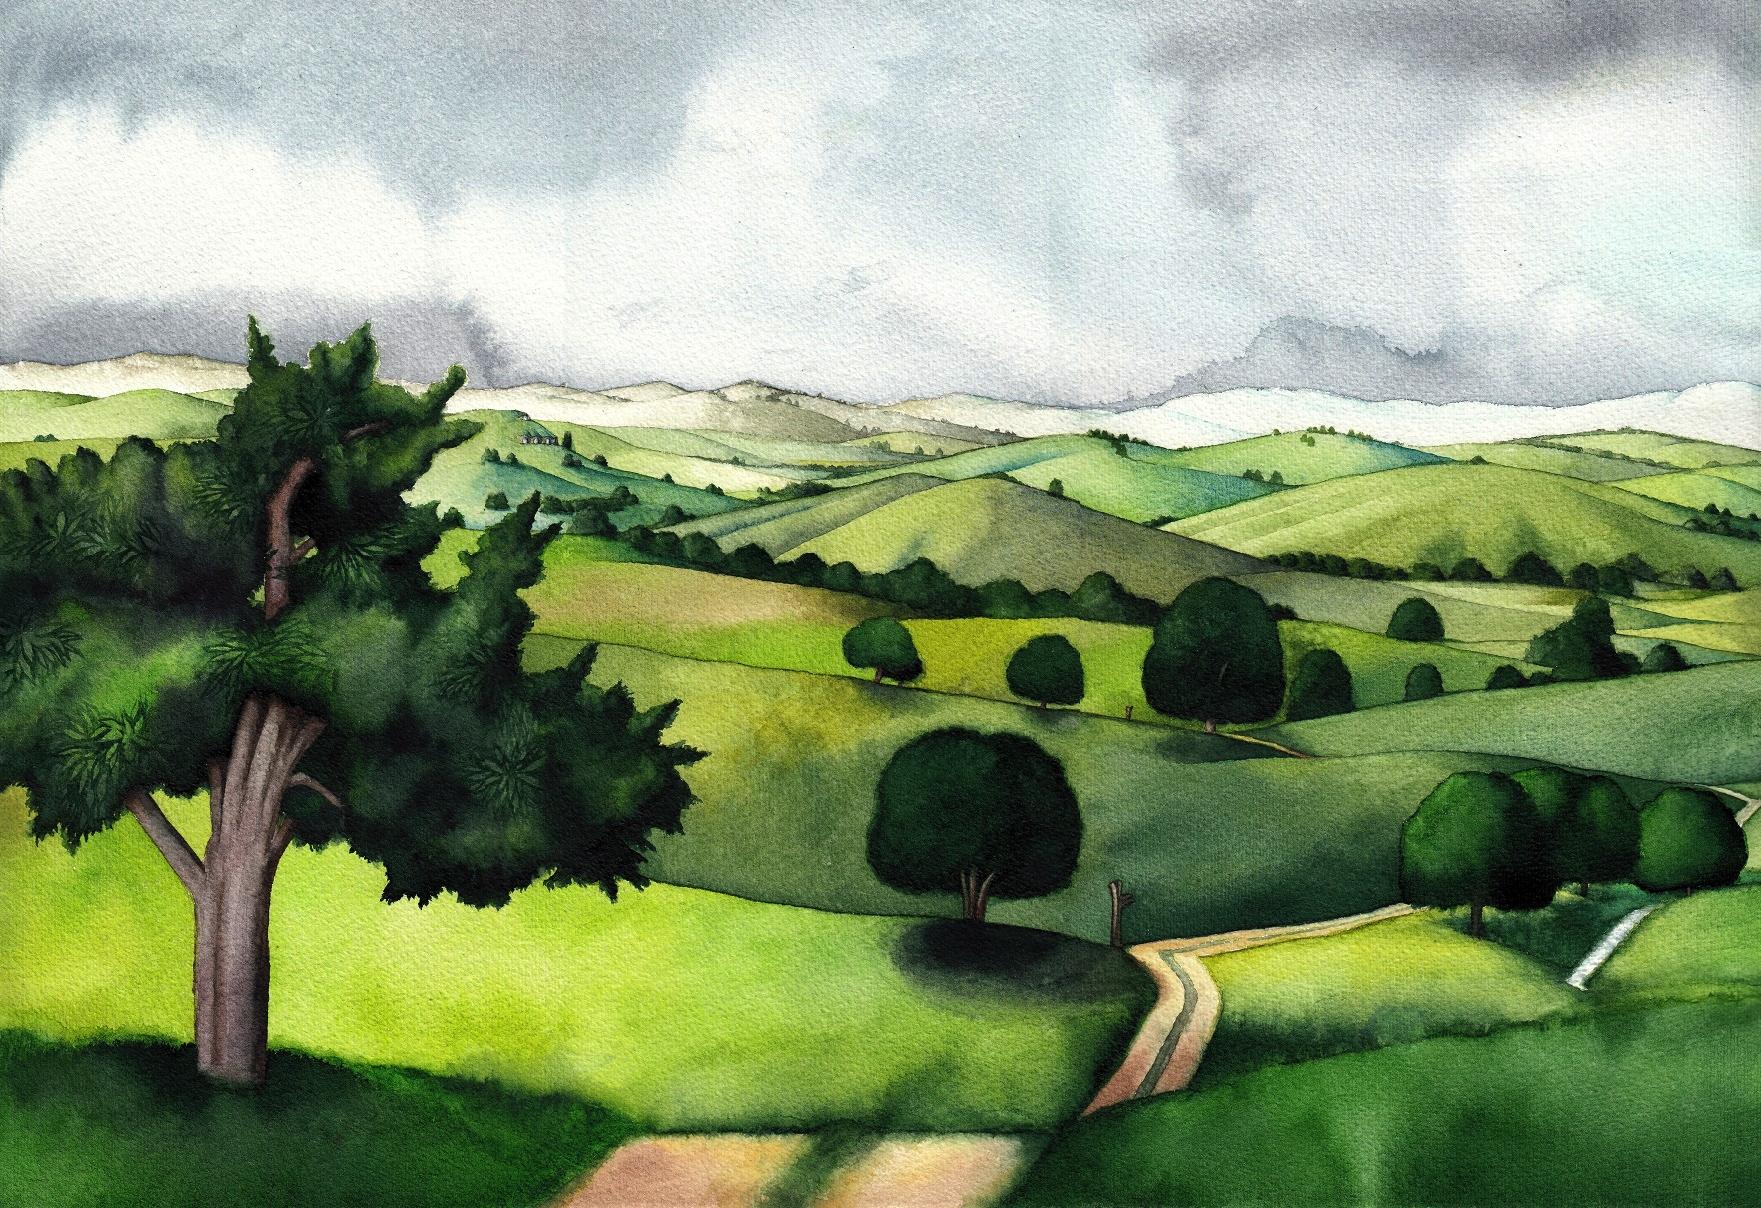 Shire hills by SarkaSkorpikova